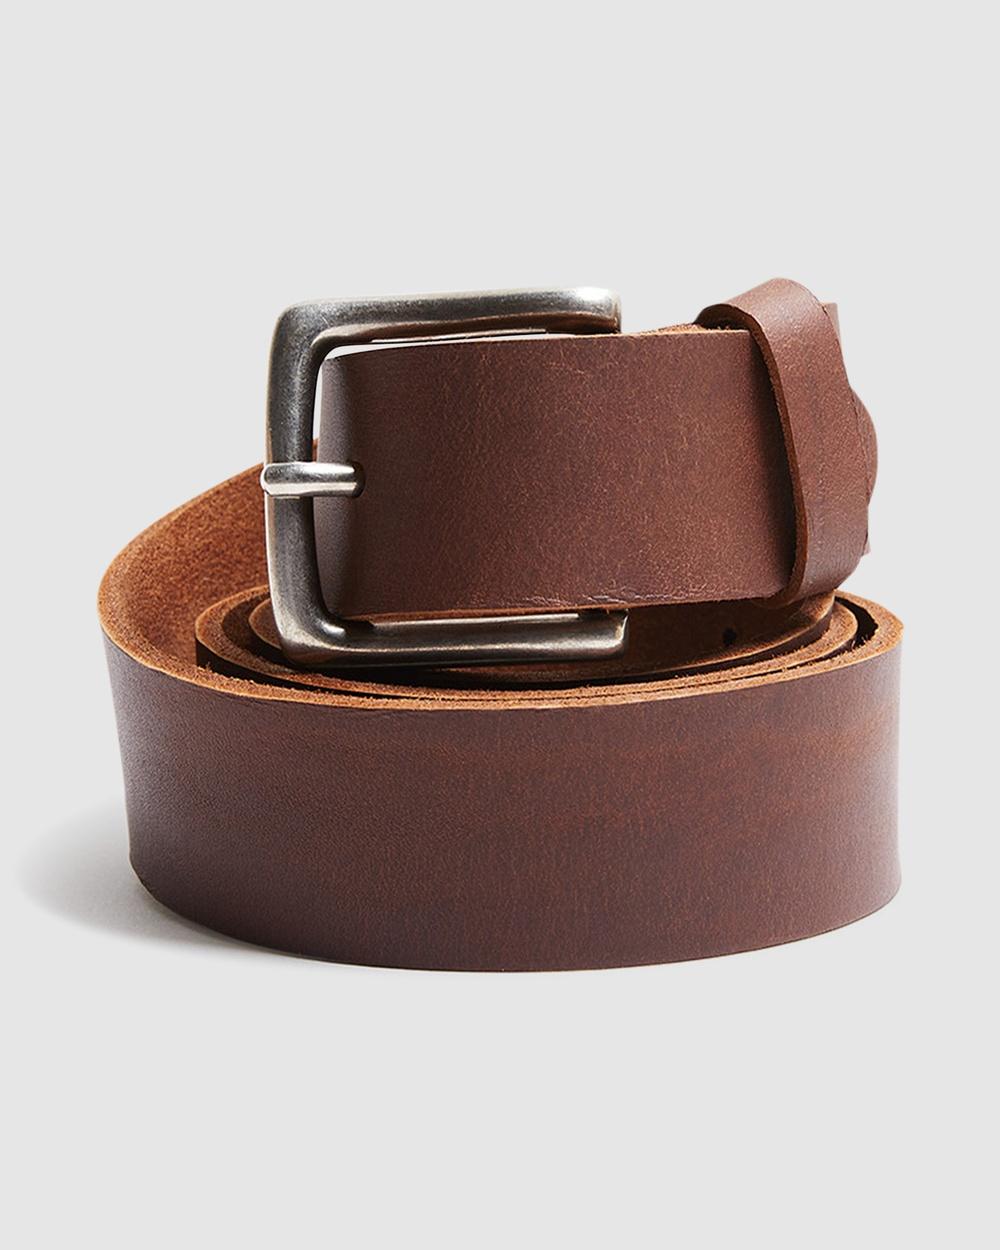 Arvust Everyday Leather Belt Belts TAN